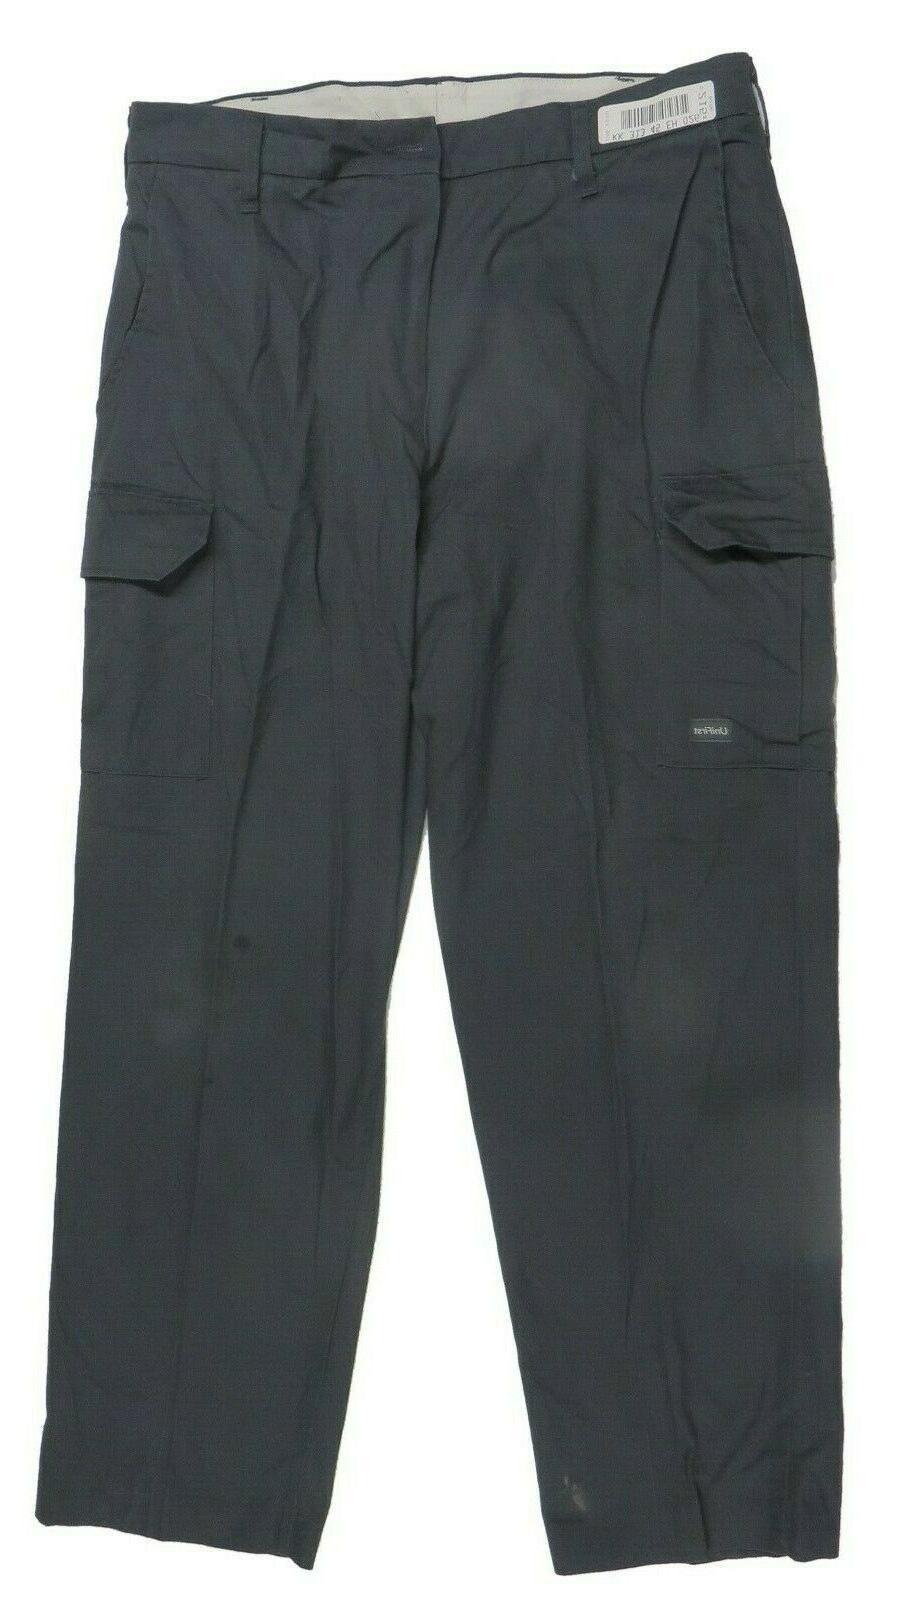 Cargo Pants Used Redkap Navy Tan